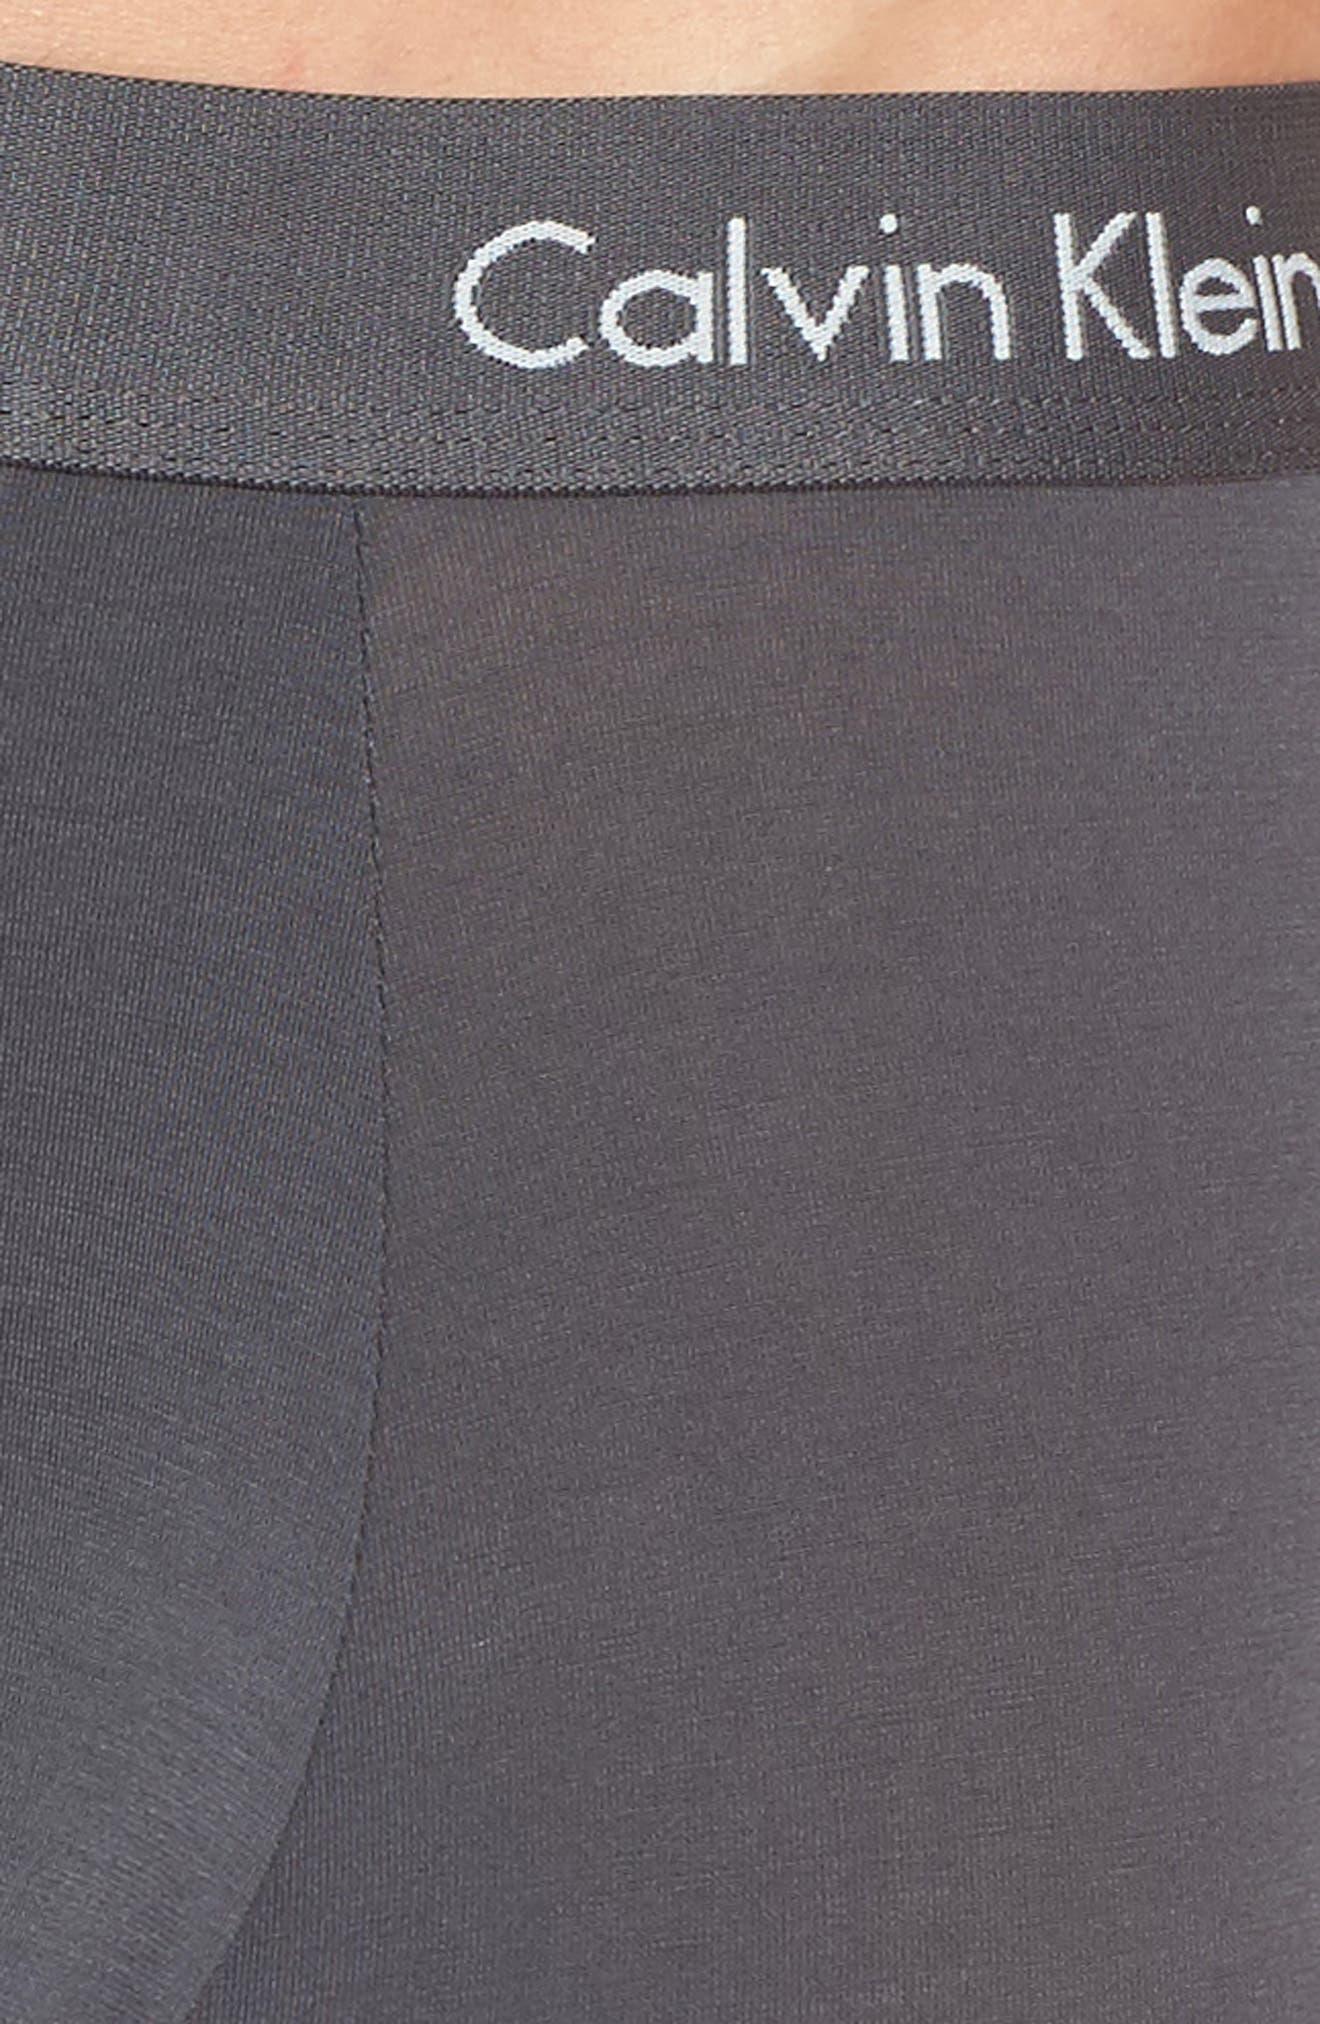 Body 3-Pack Stretch Modal Boxer Briefs,                             Alternate thumbnail 5, color,                             Blue Shadow/ Mink/ Black